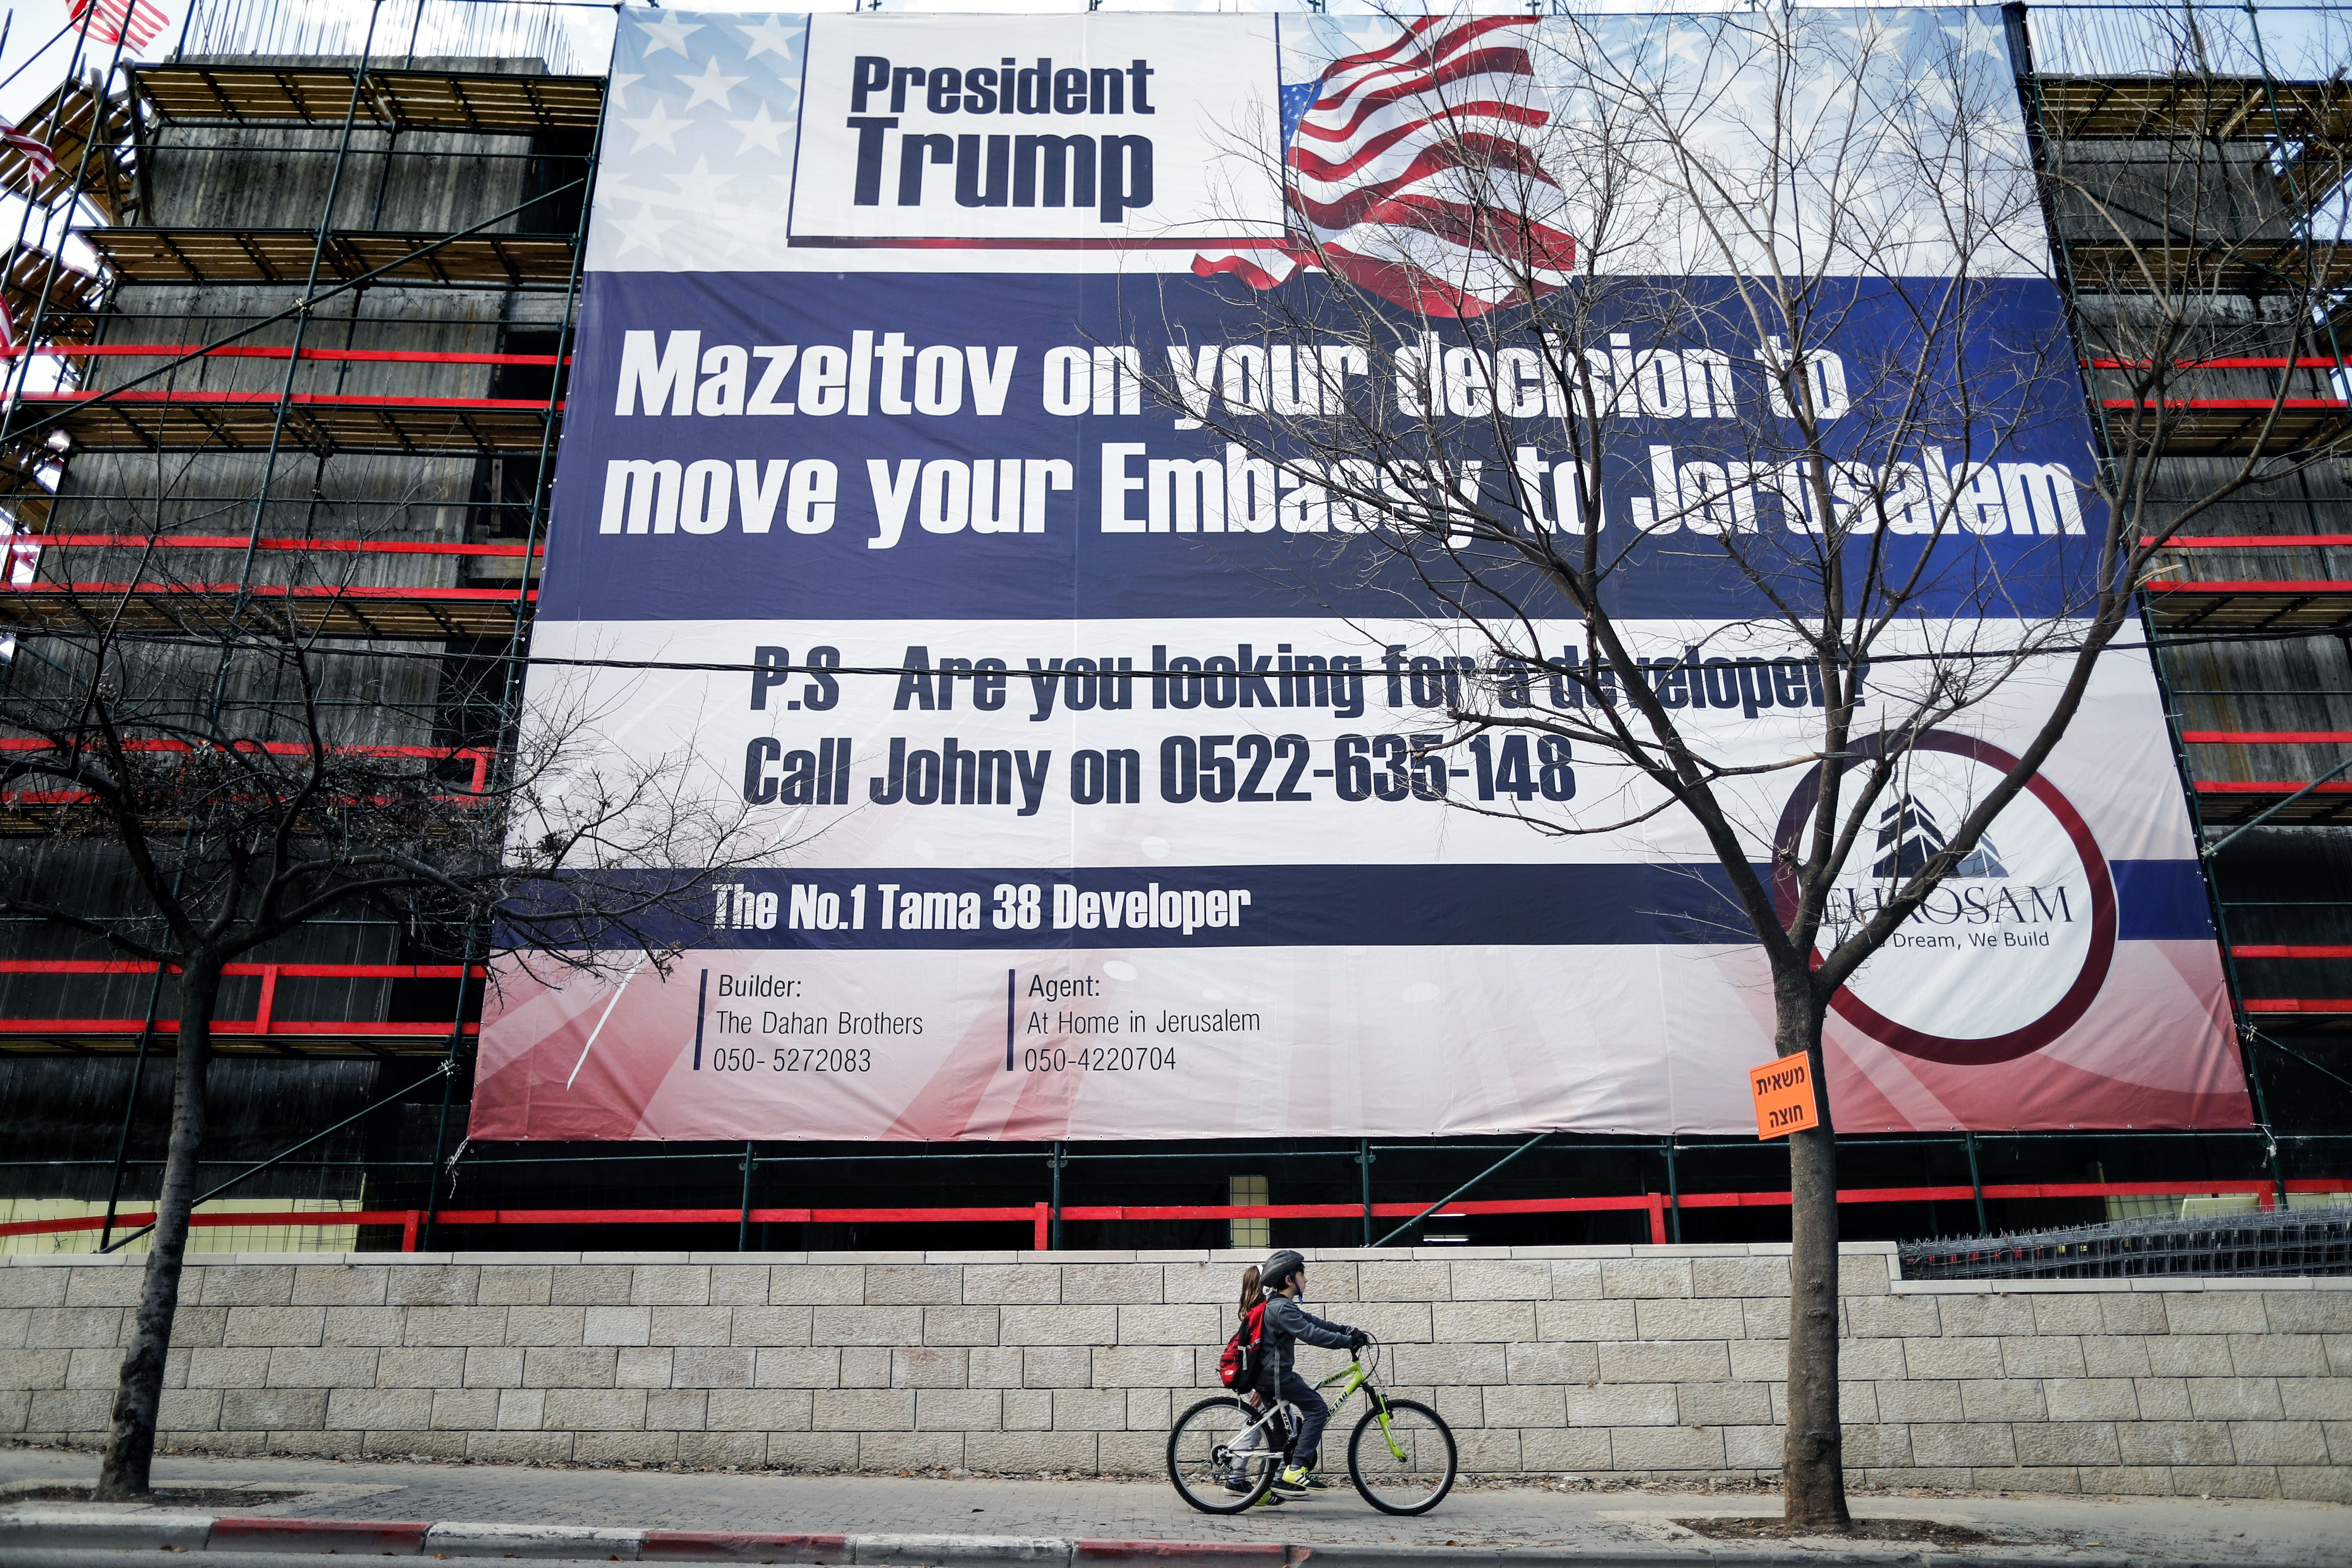 ISRAEL-PALESTINIAN-US-POLITICS-DIPLOMACY